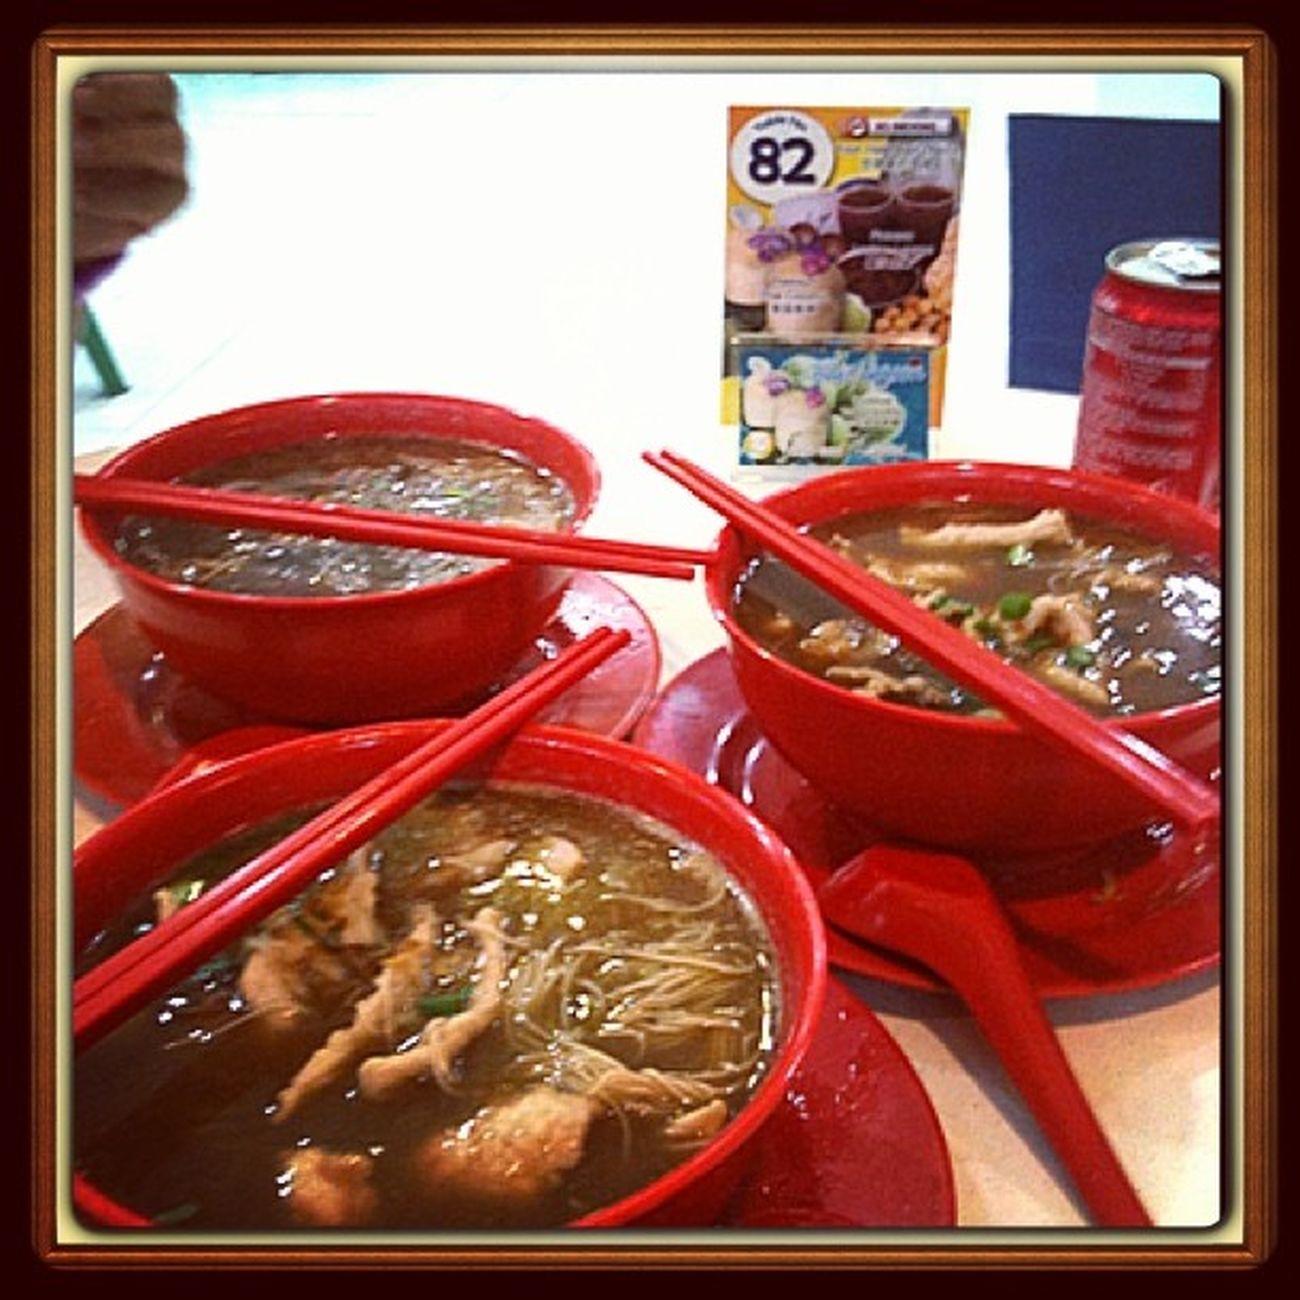 Late night supper! (: Kambangan NeedmoreCFerstostayineast😫 InstaFrame YourMoments